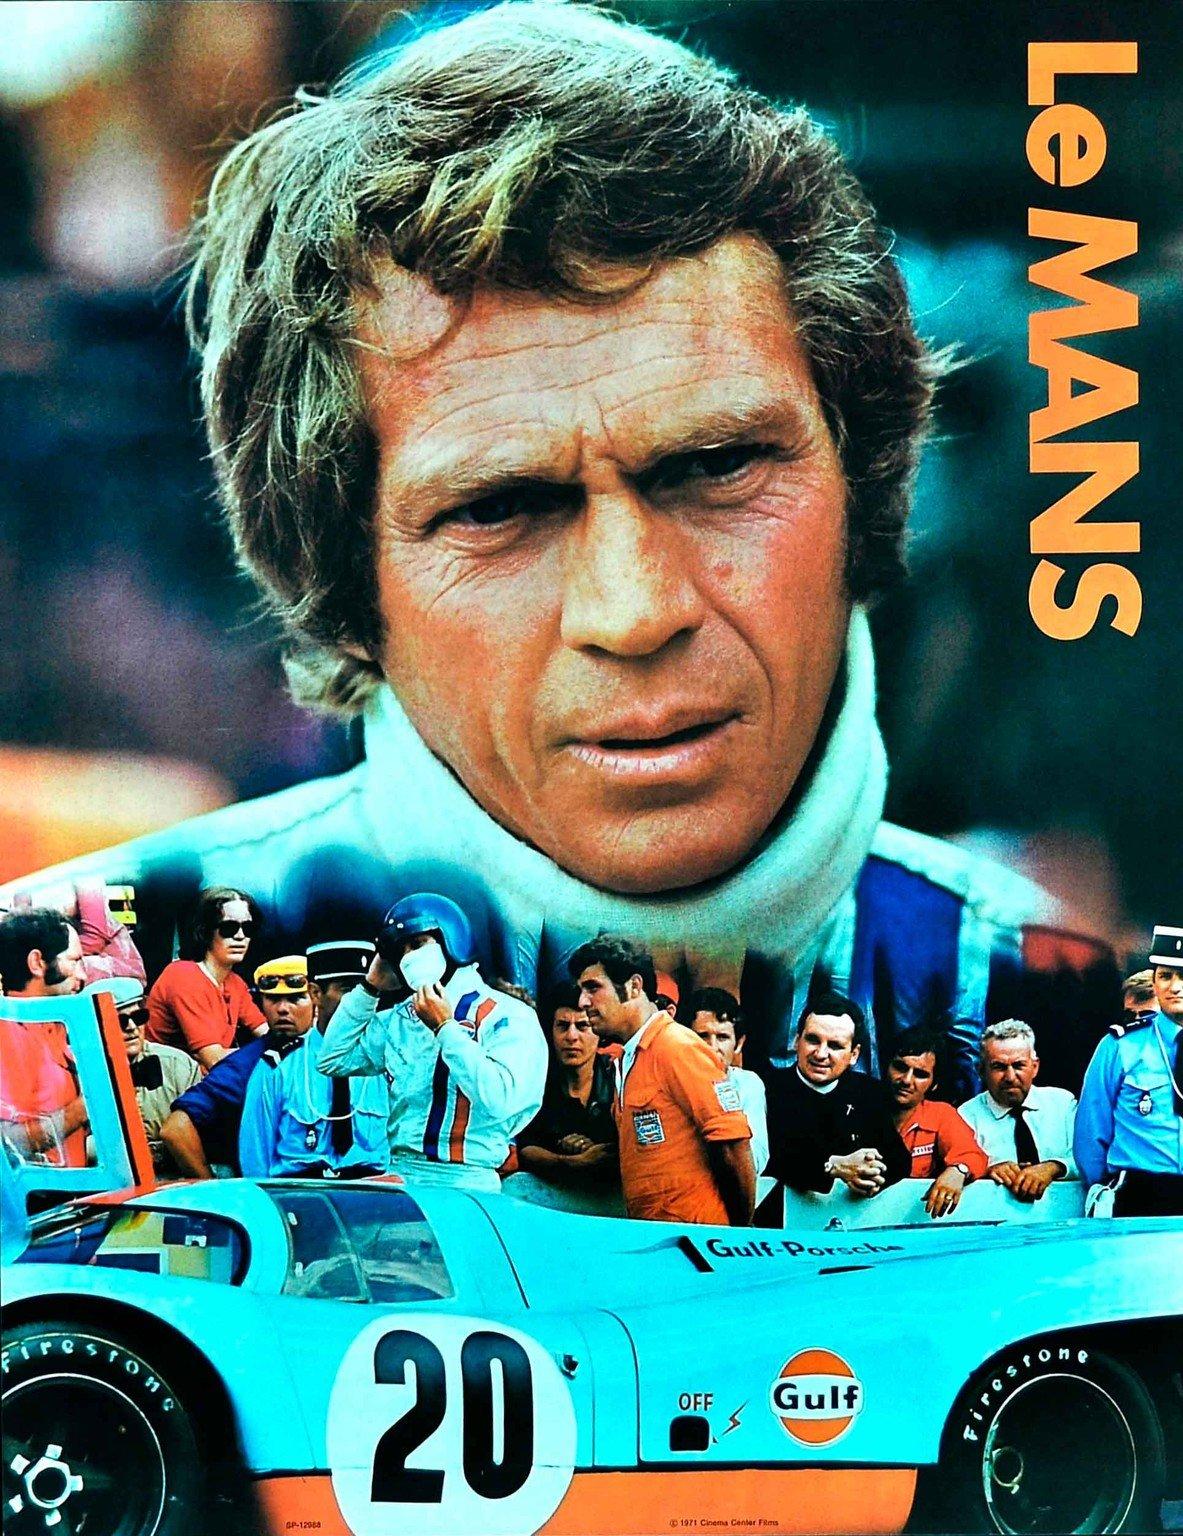 Steve Mcqueen Y Le Mans El Documental